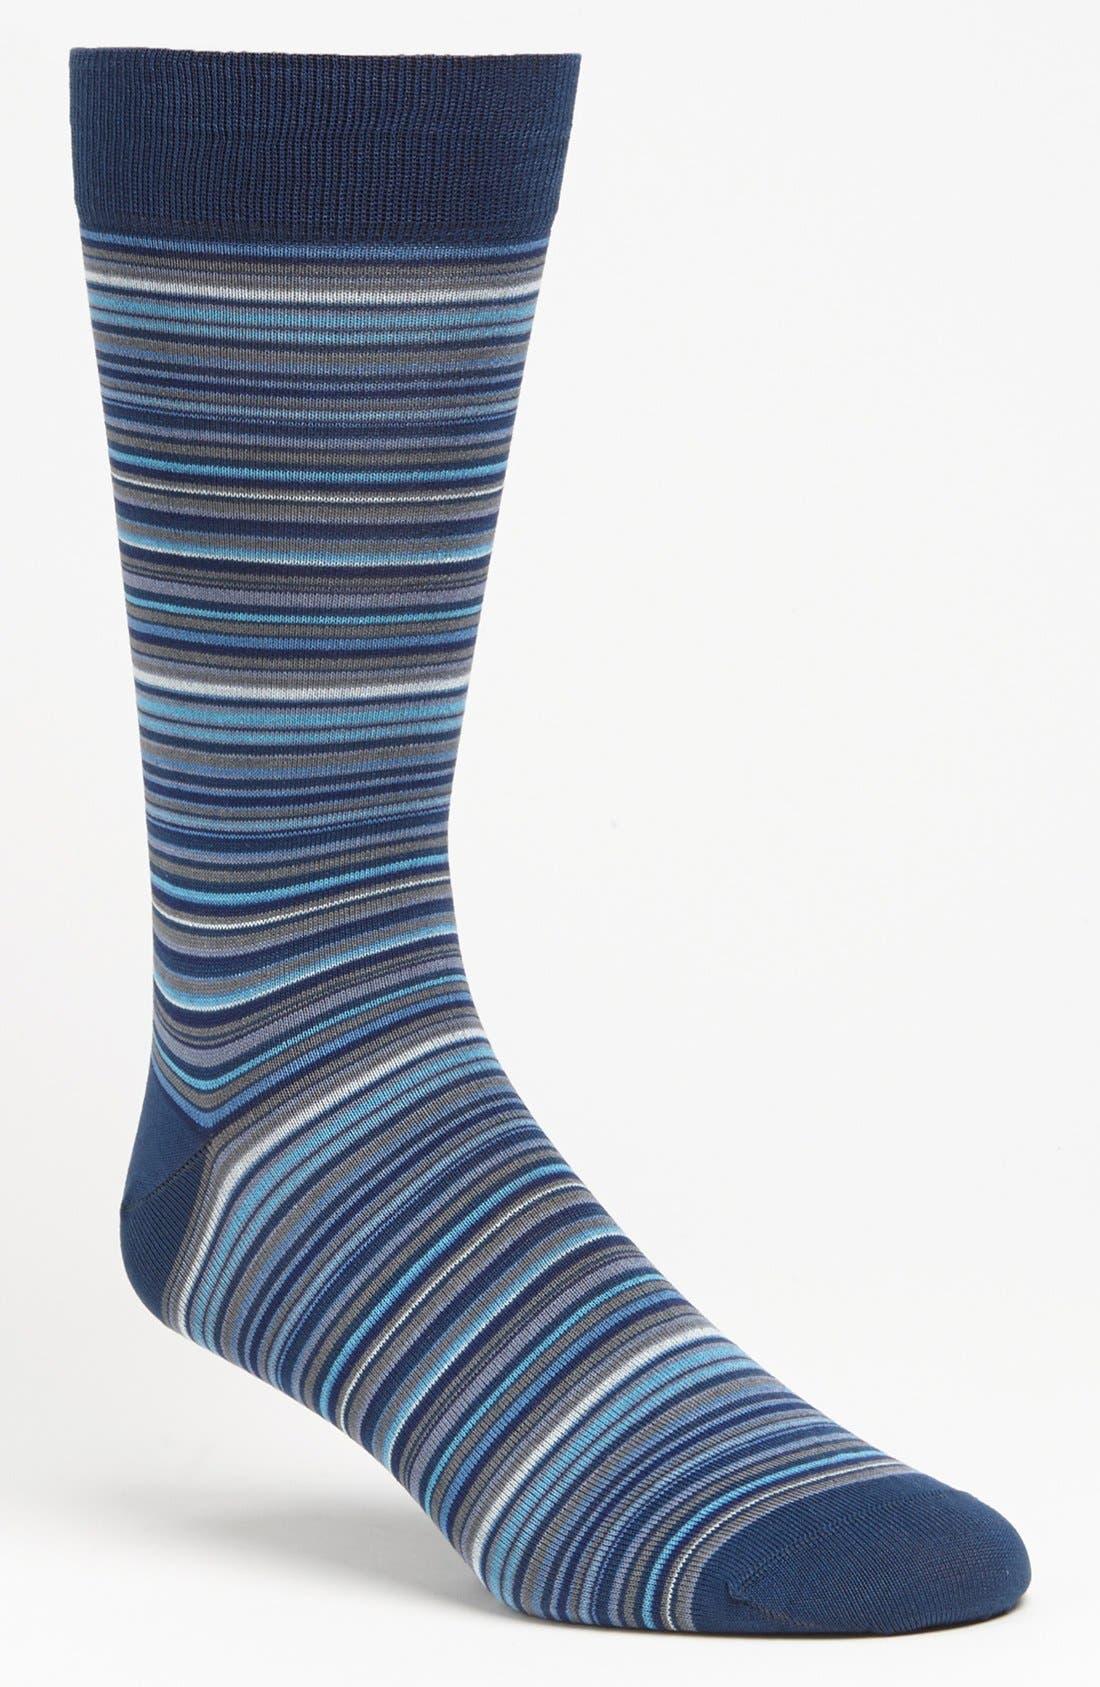 Alternate Image 1 Selected - Marcoliani 'Mirage' Stripe Socks